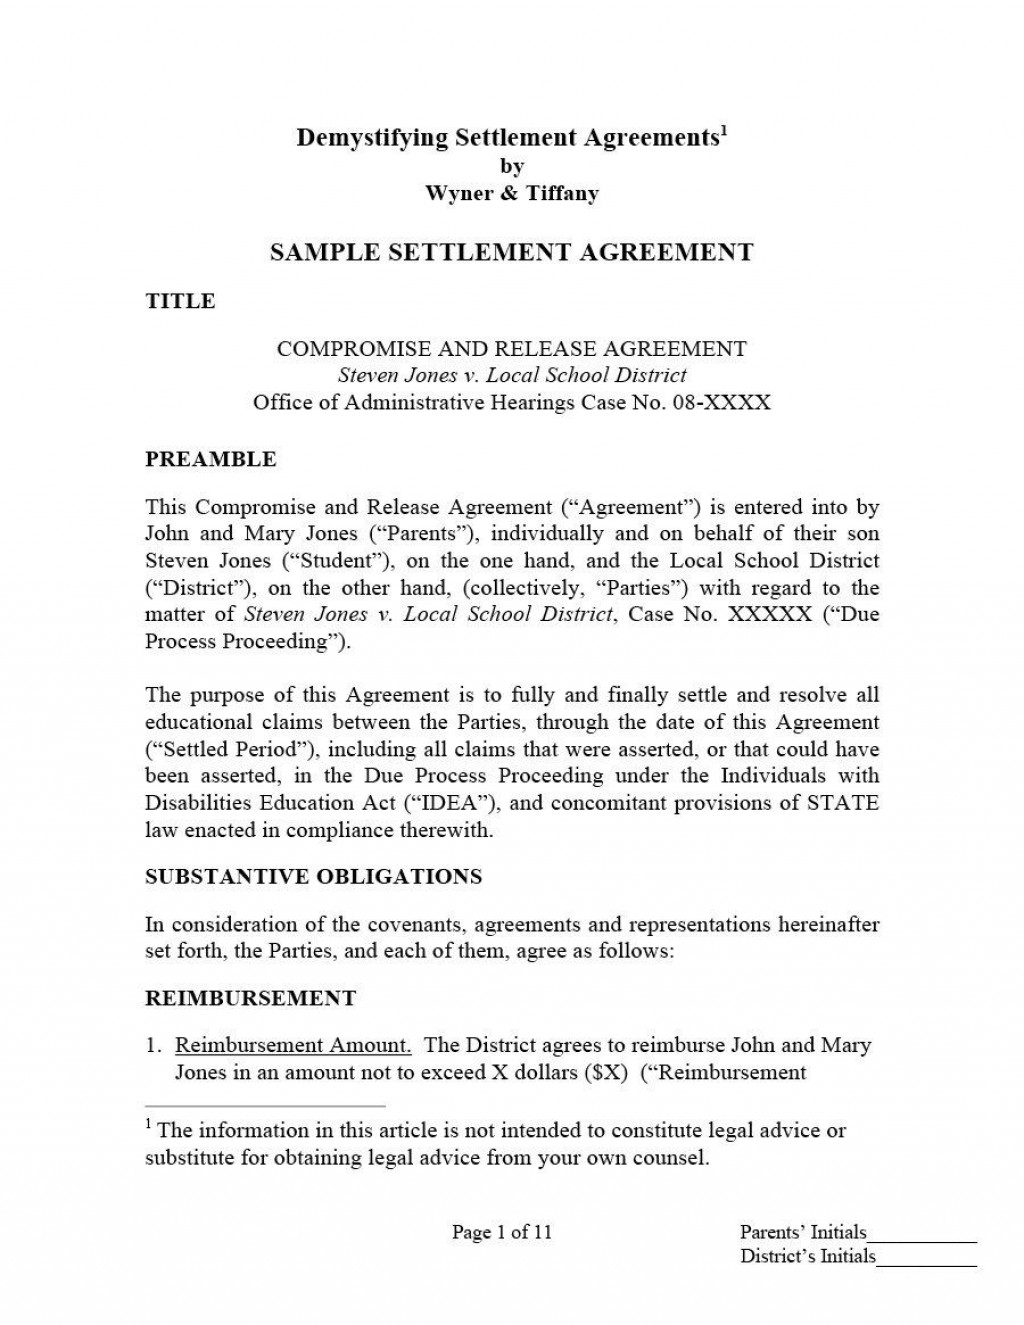 002 Wonderful Divorce Settlement Agreement Template Highest Clarity  Sample New York Marital Uk South AfricaLarge